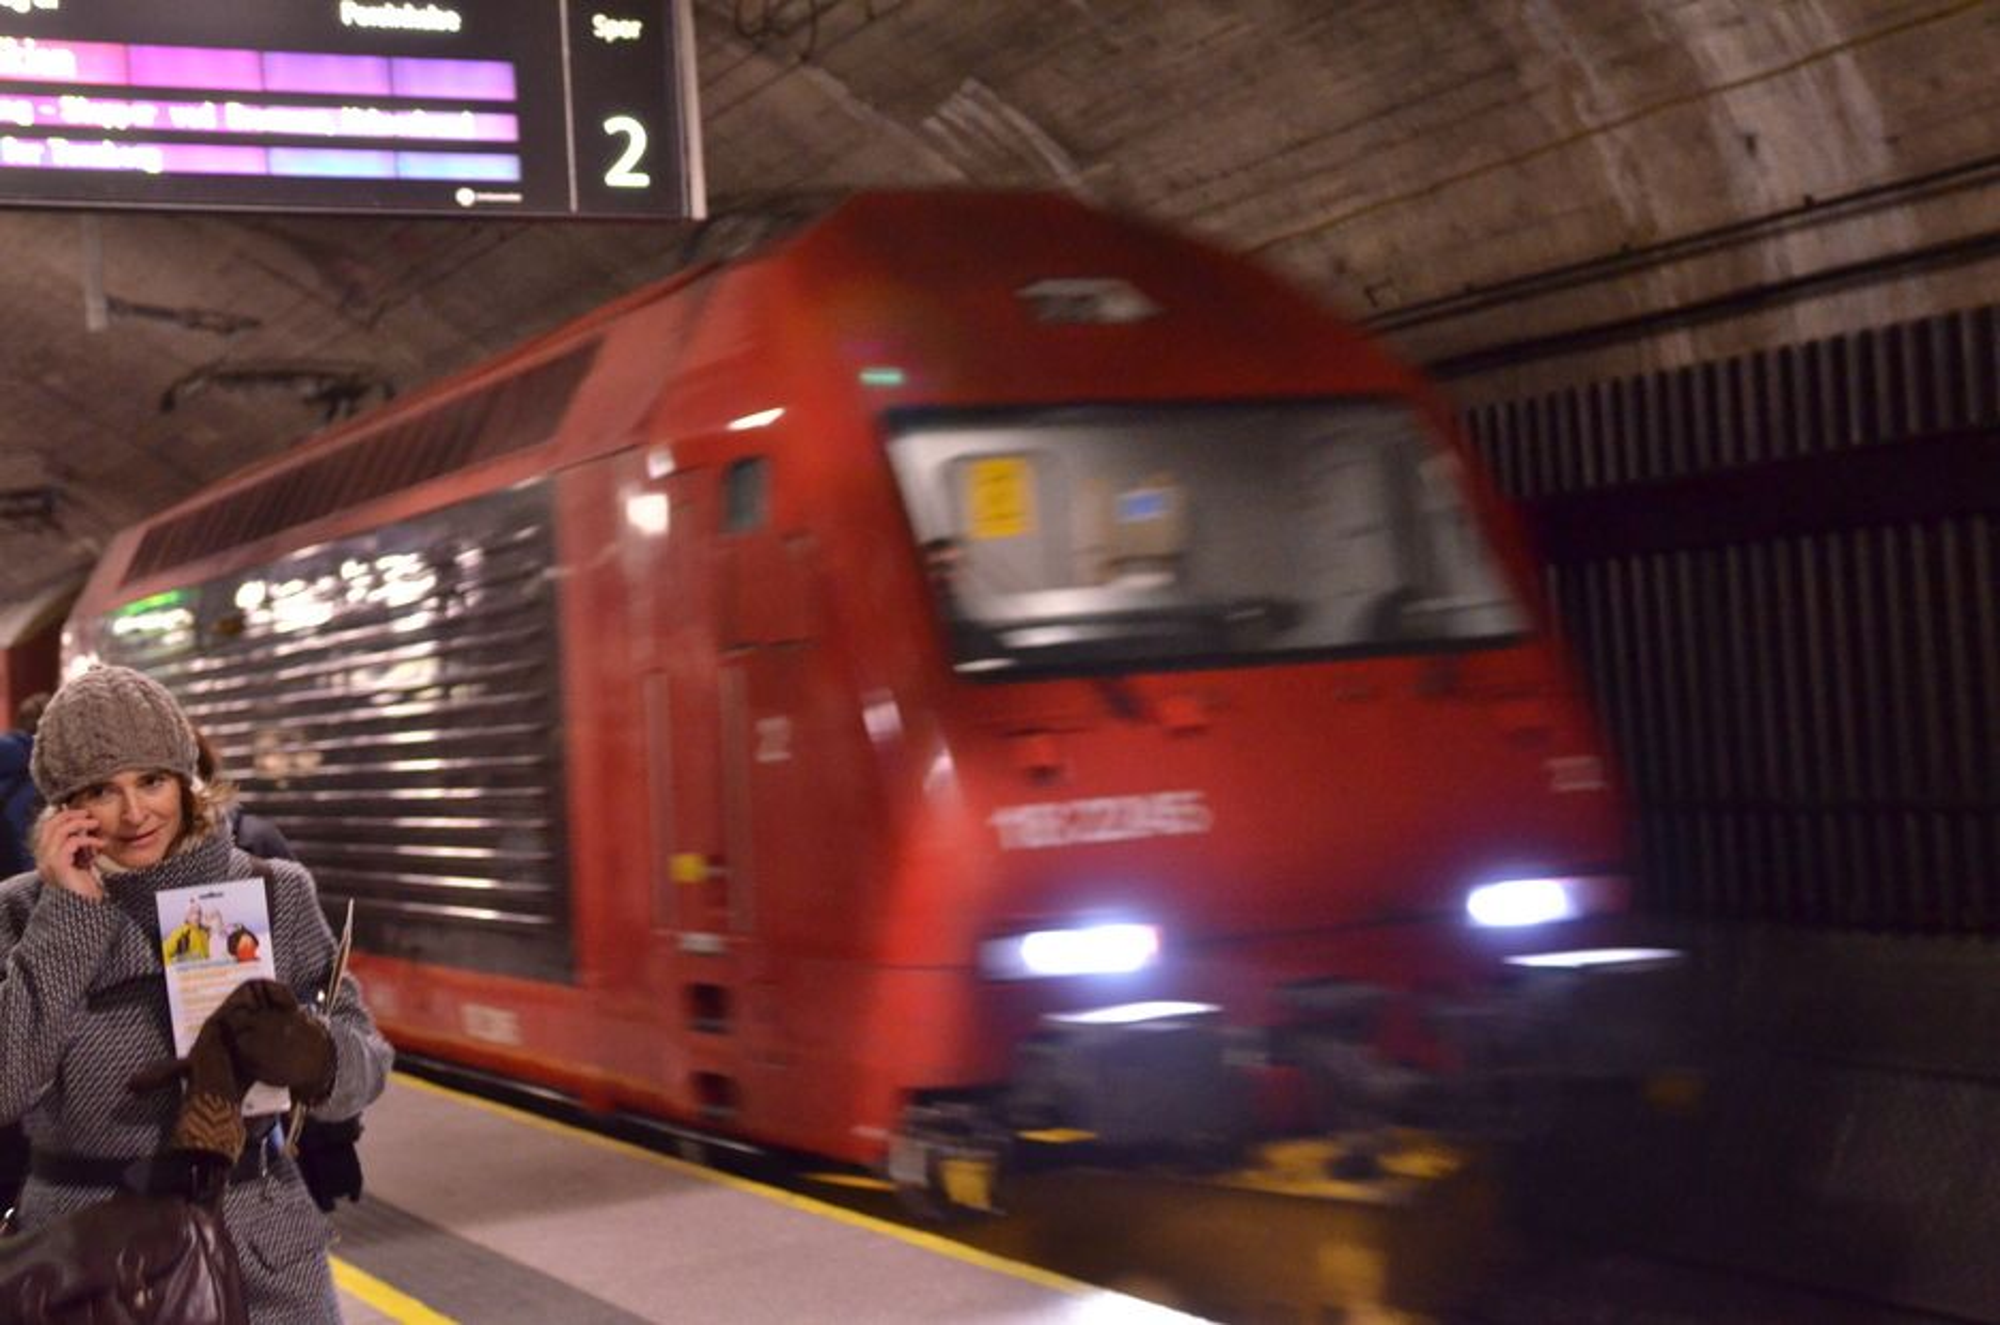 Jernbaneverket har registrert 465 signalfeil så langt i år.